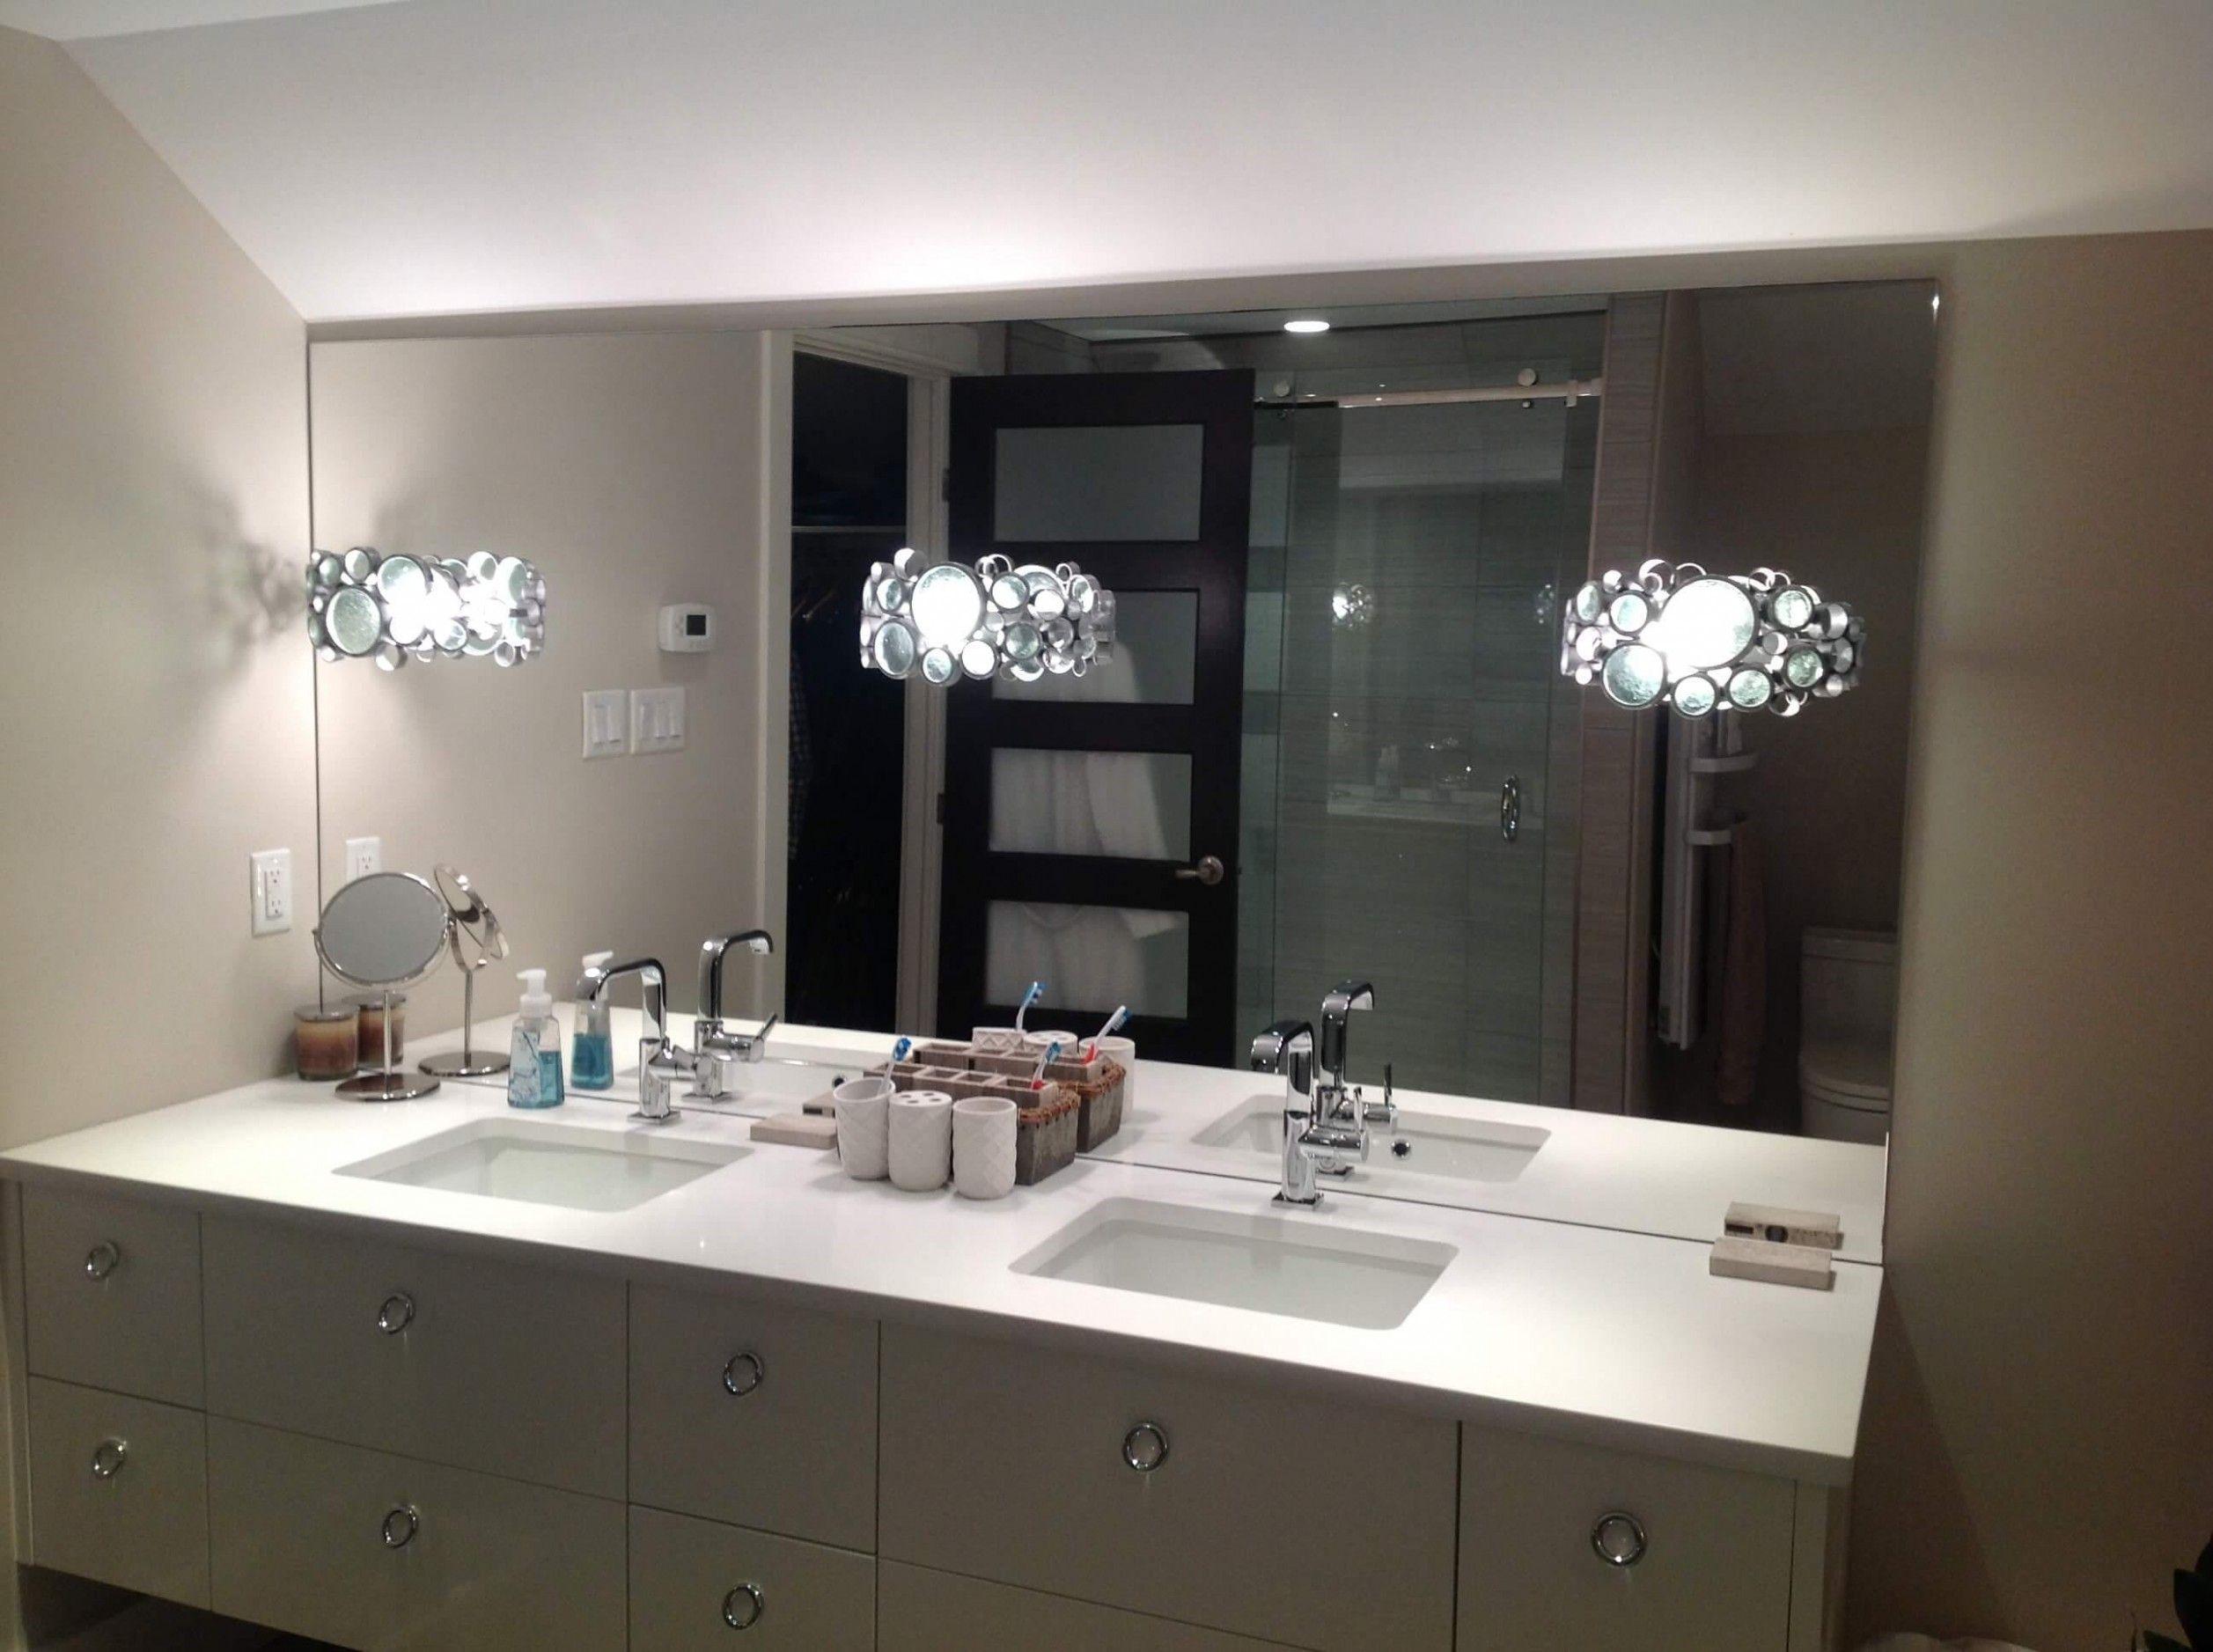 ikea bathroom vanity mirror in 2020 modern bathroom on custom bathroom vanity mirrors id=50736